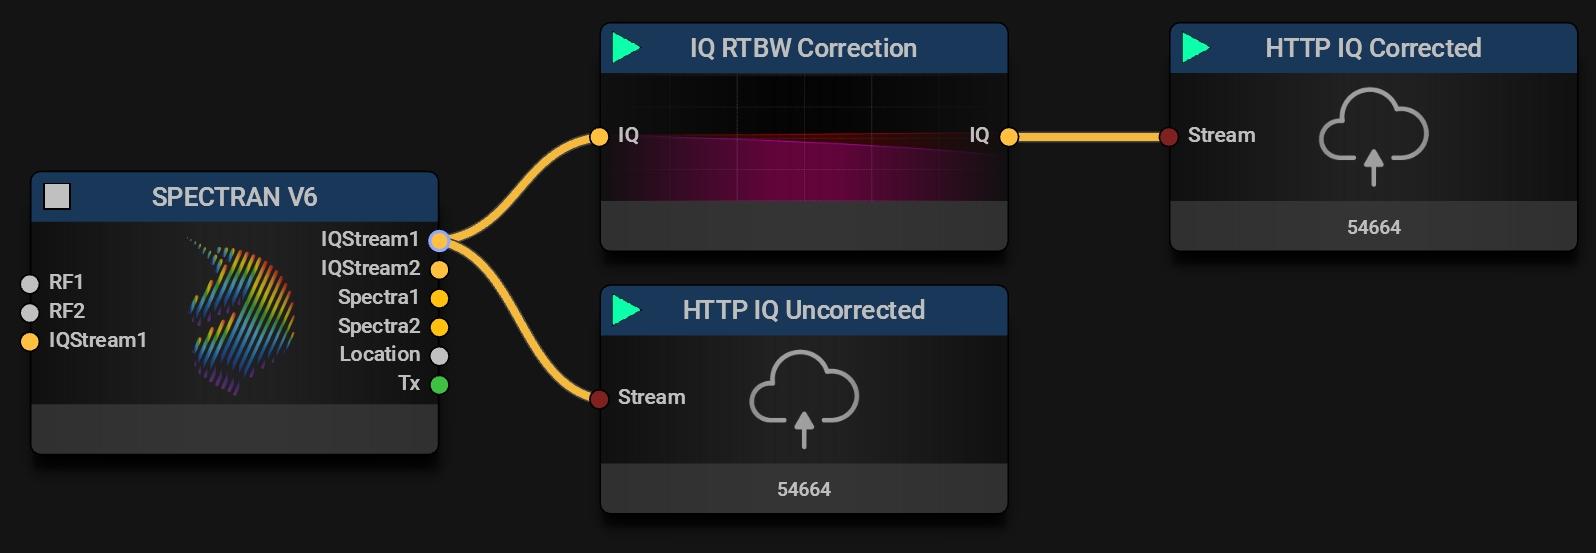 IQ RTBW Correction Block   Typical Mission